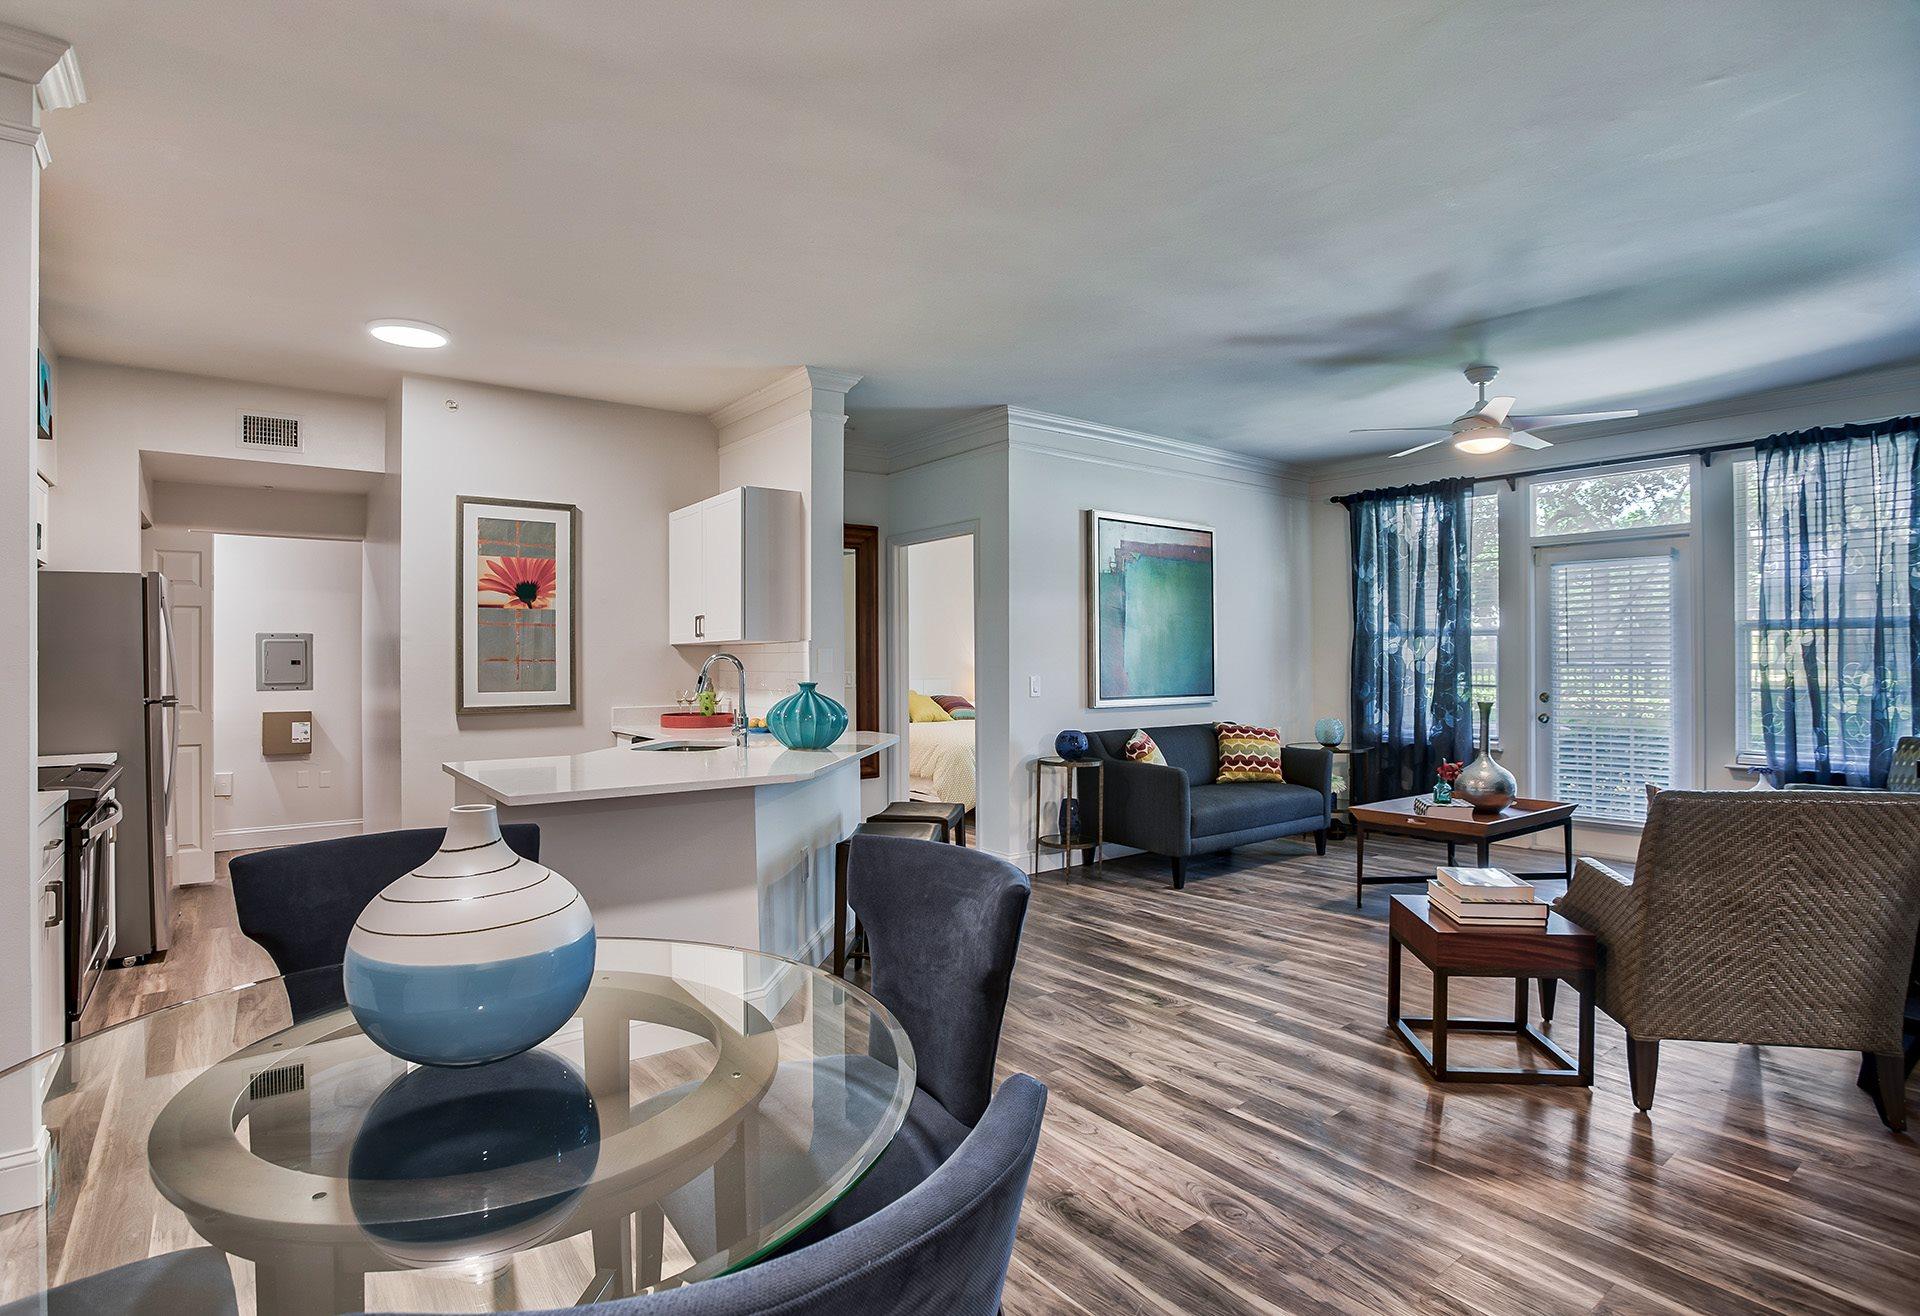 Renovated Apartments with Wood Plank Flooring at Windsor at Miramar, Florida, 33027